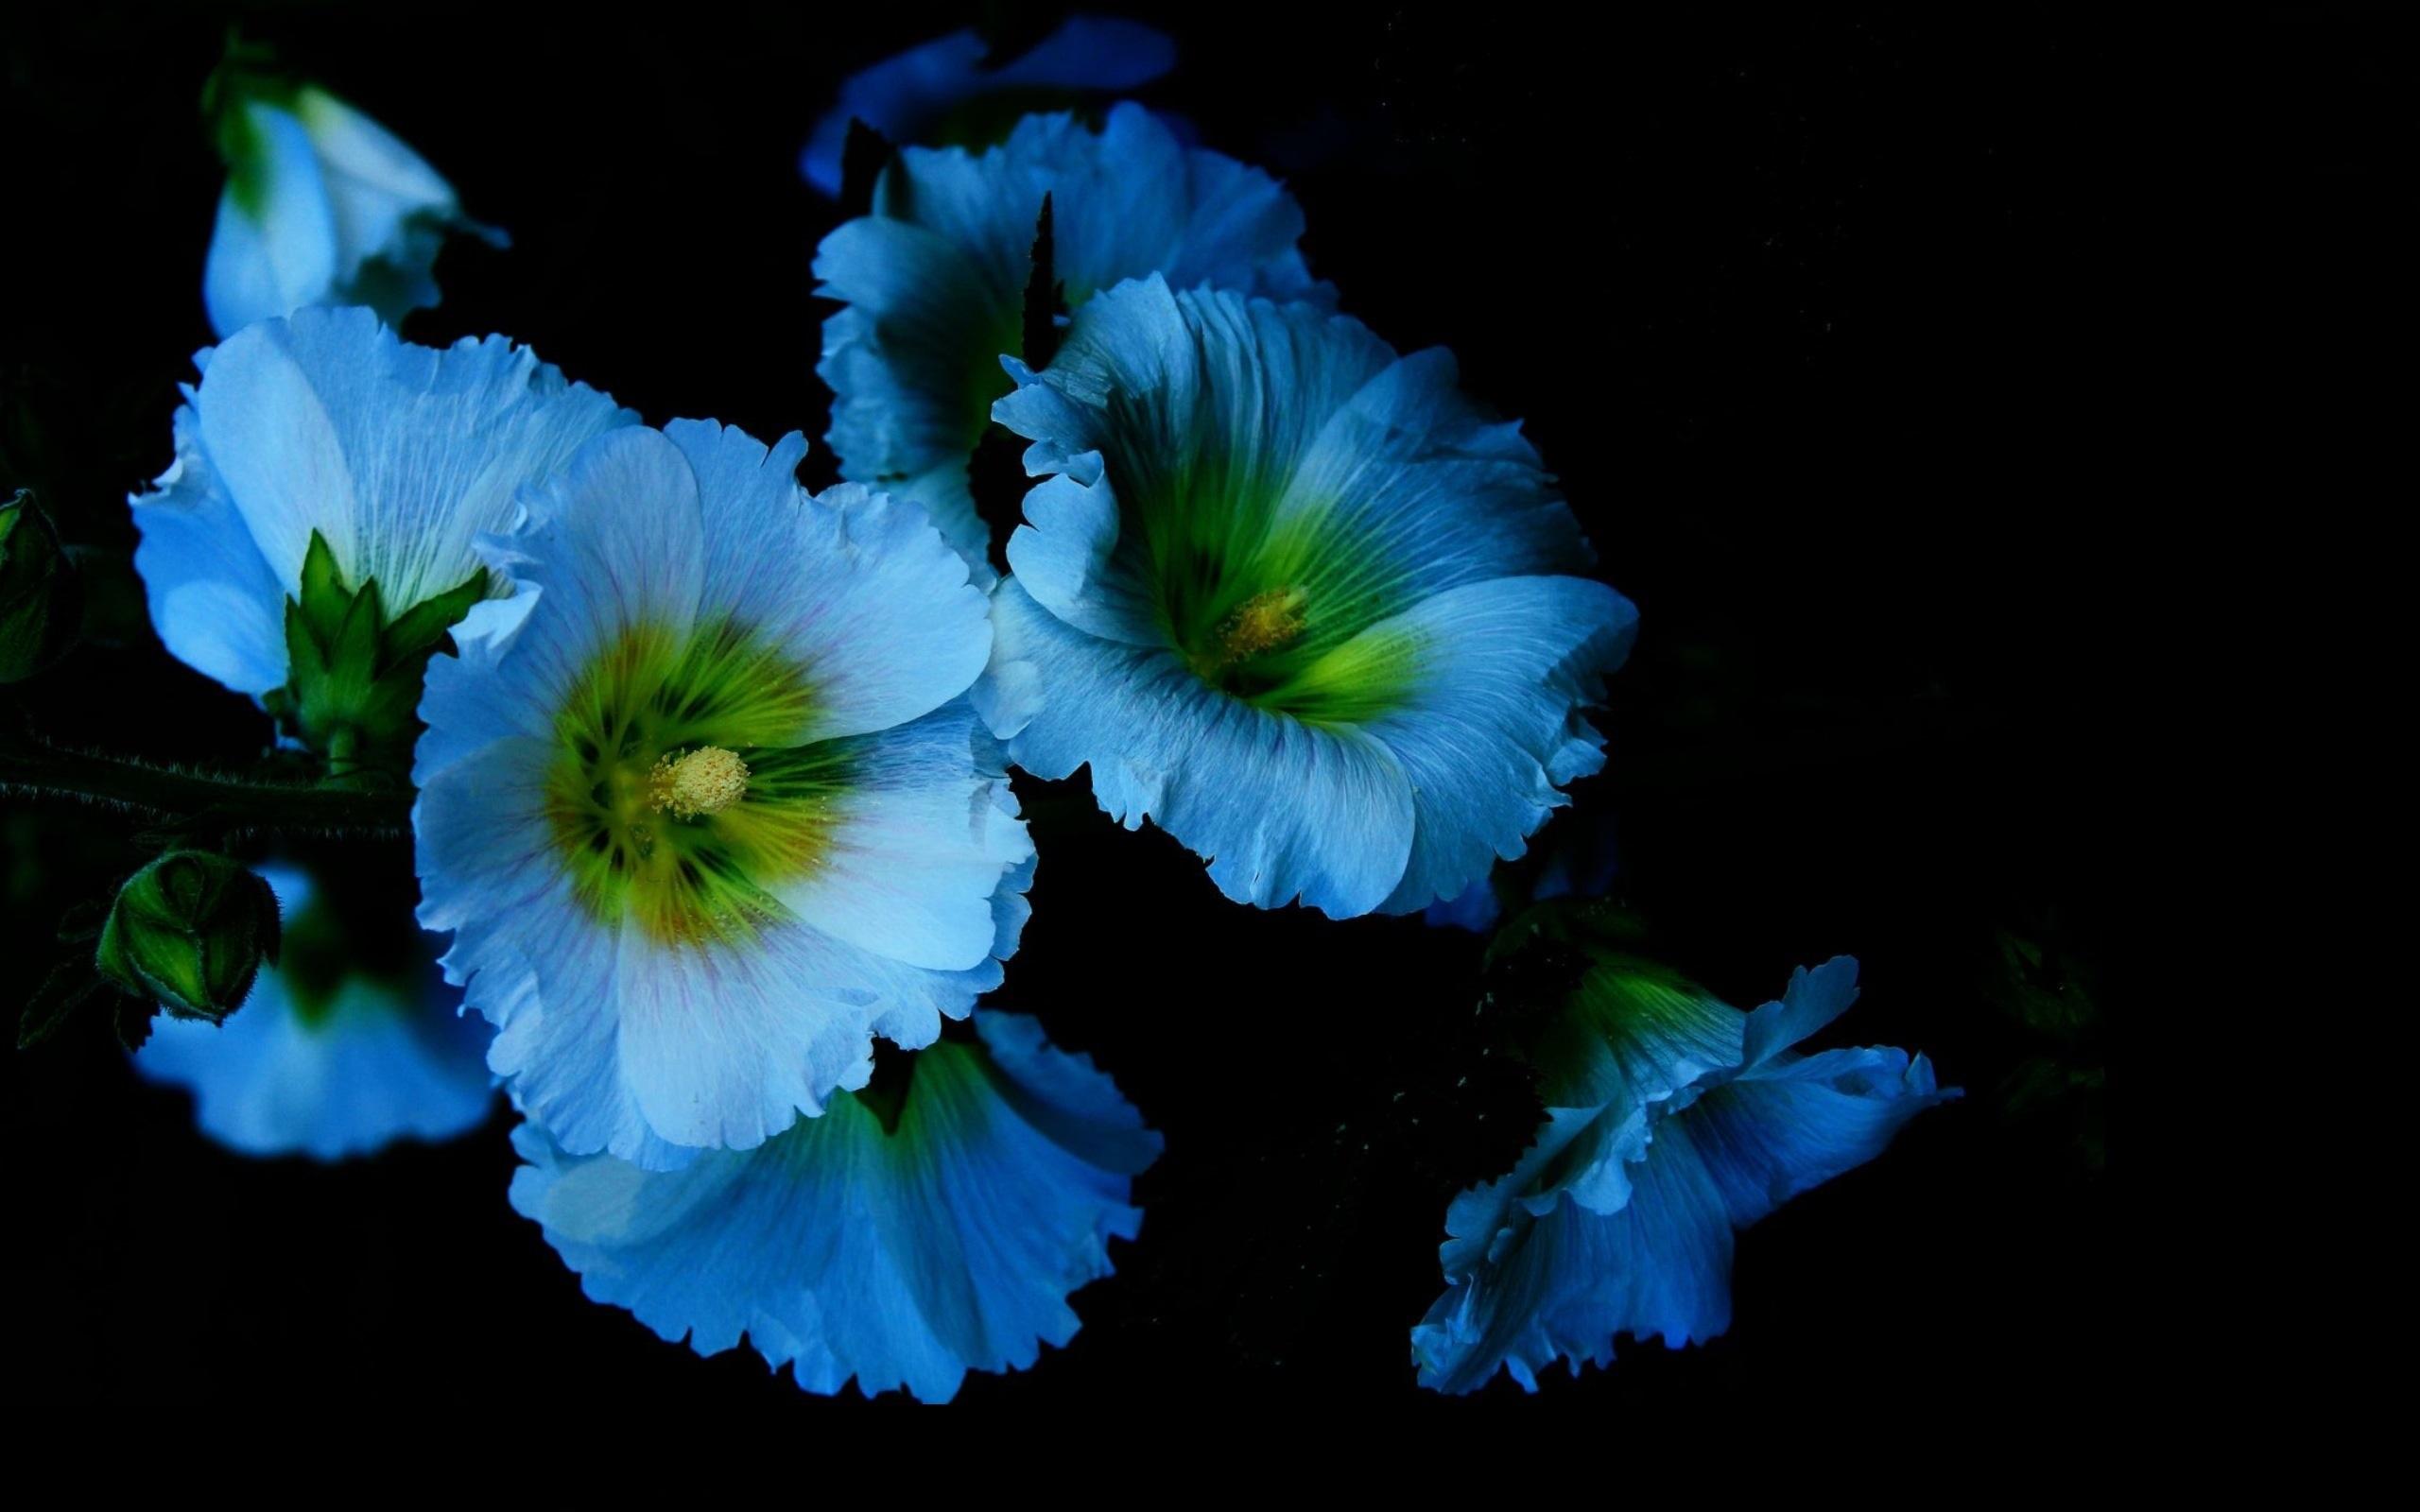 Fondos De Pantalla Flores Azules Petalos Malva Fondo Negro